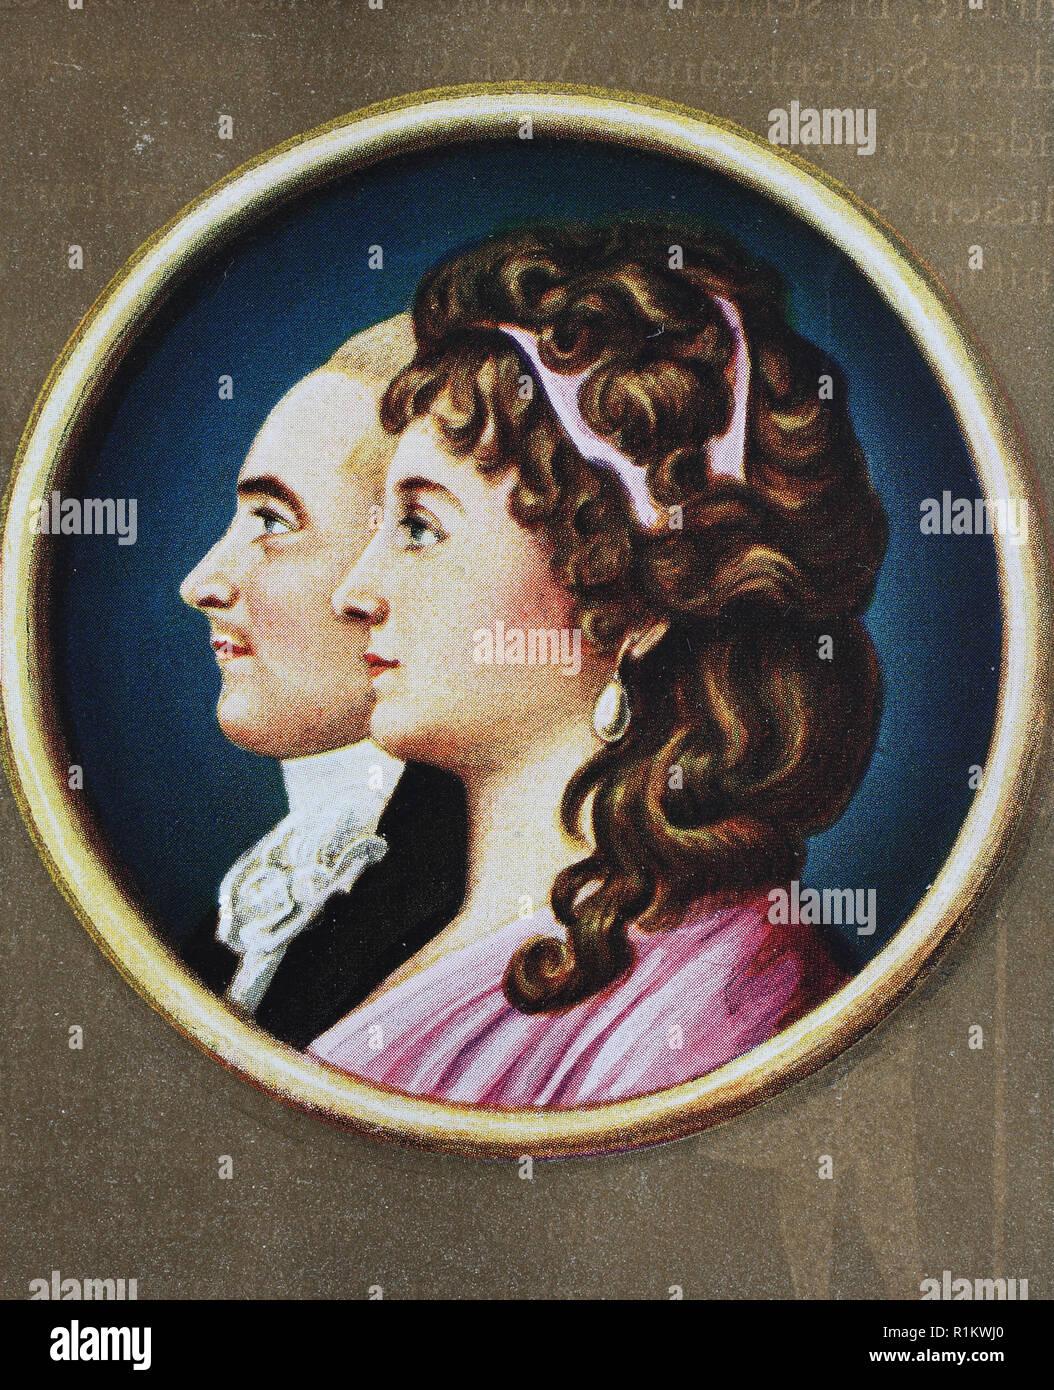 Anna Bernhardt digital improved reproduction, anna elisabeth lili schÃ